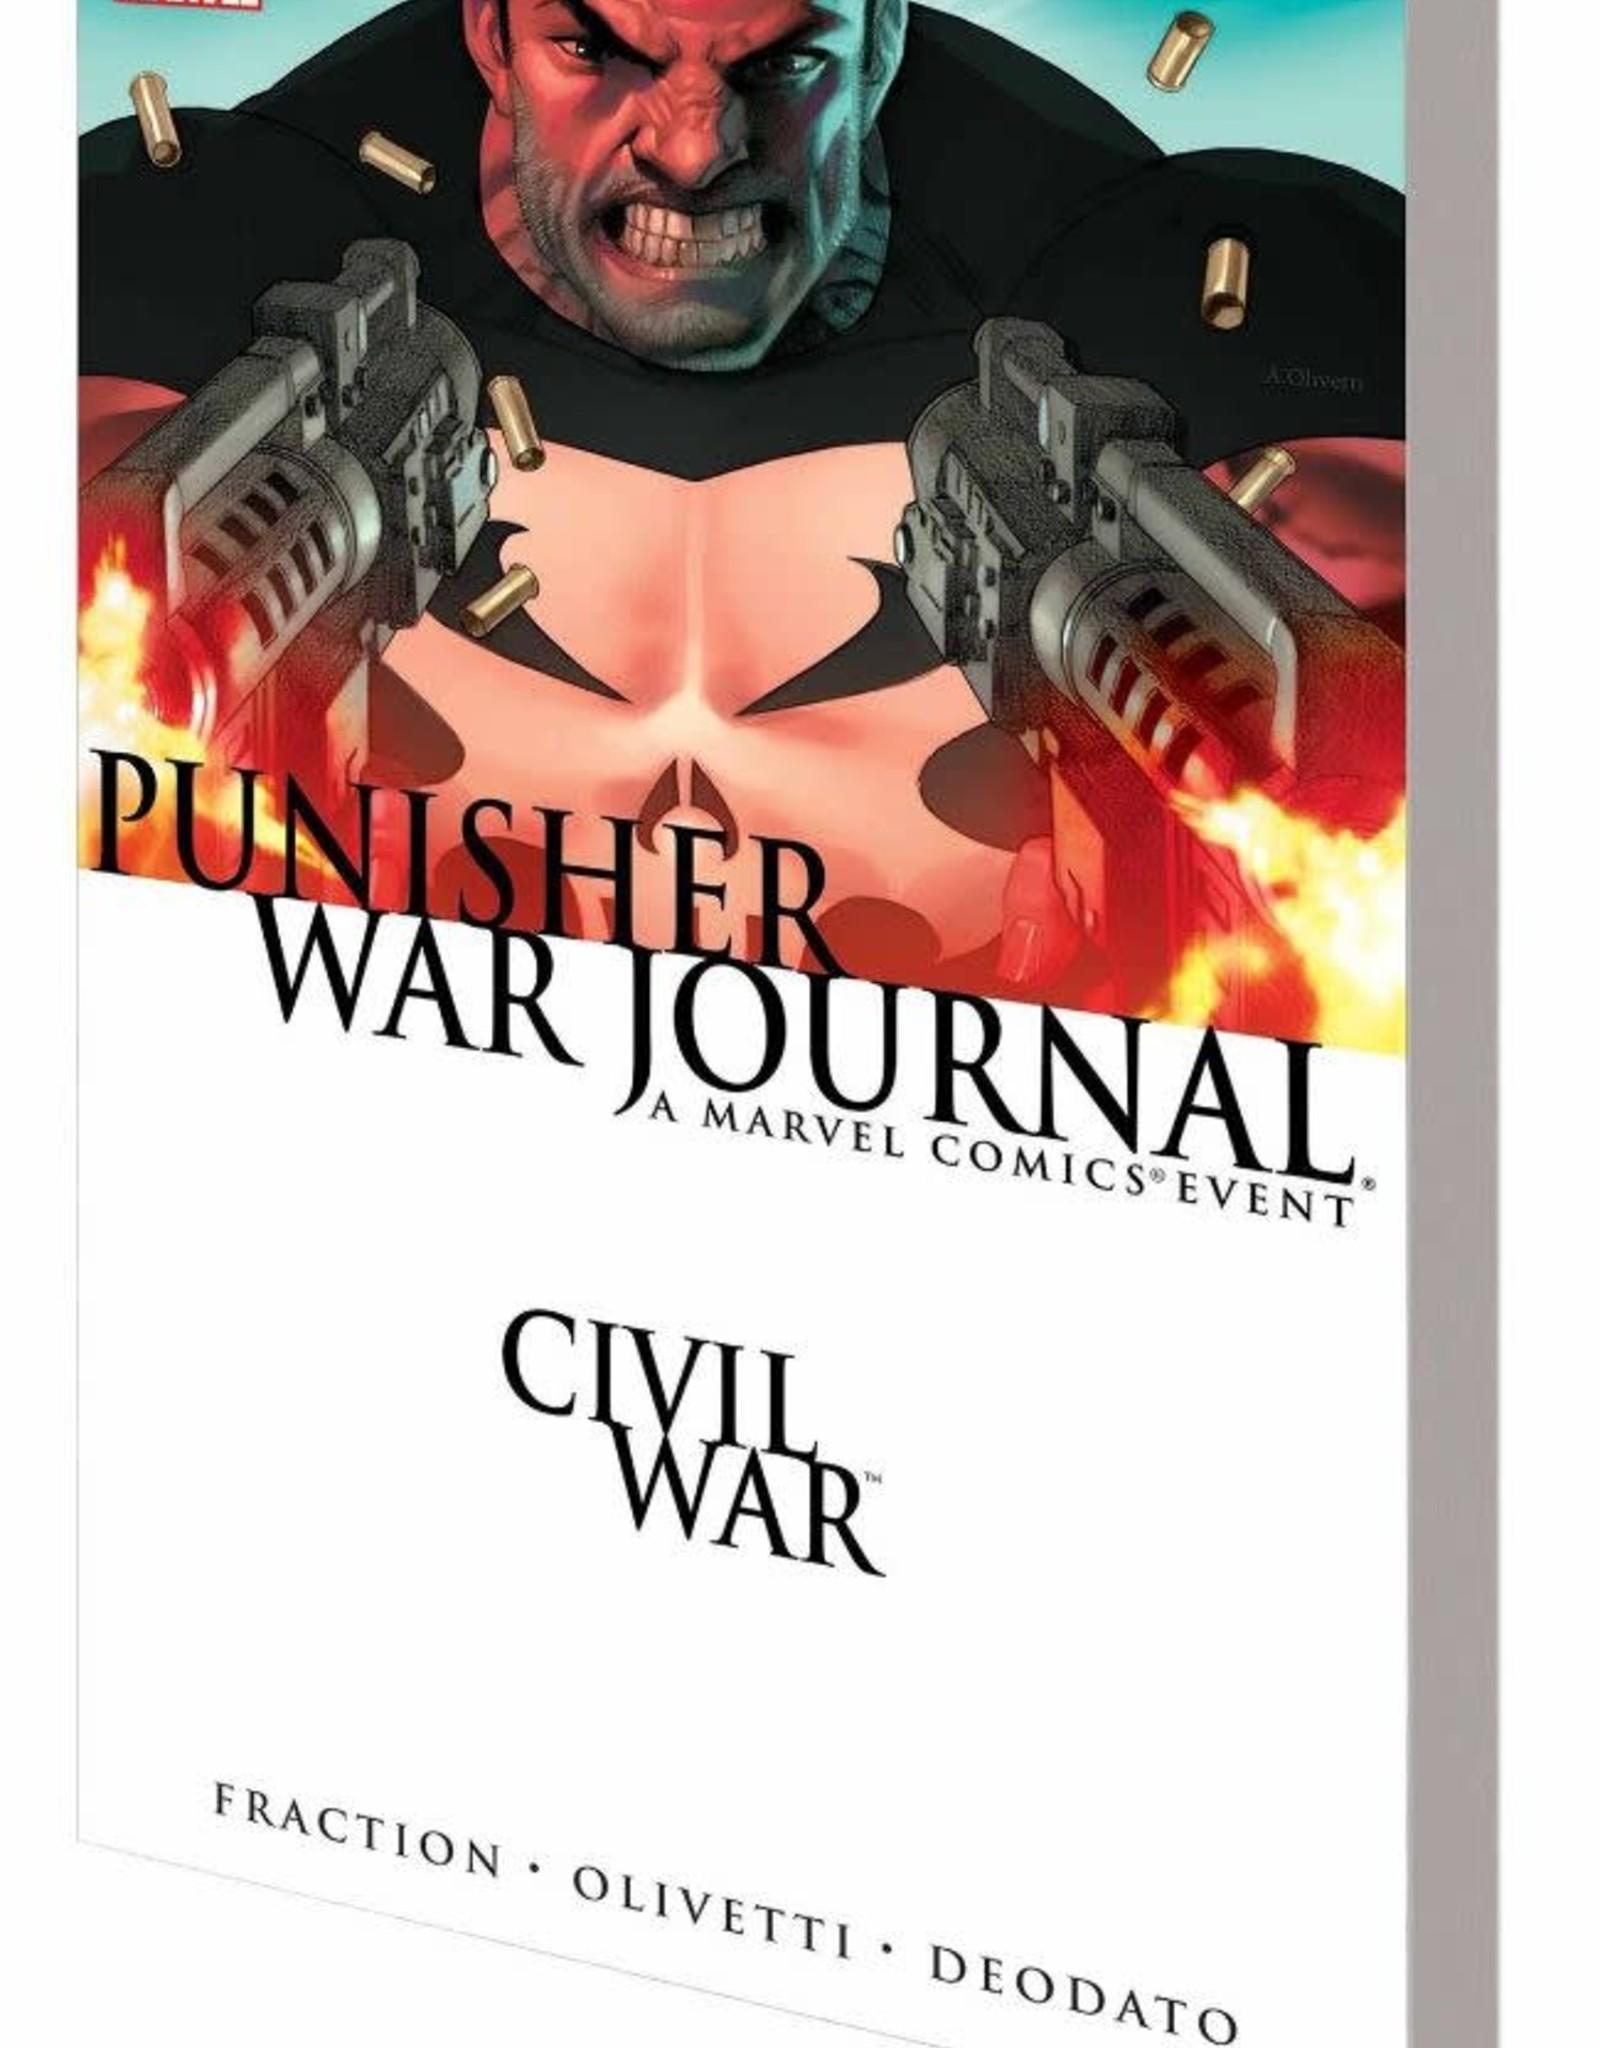 Marvel Comics Civil War: Punisher War Journal TP